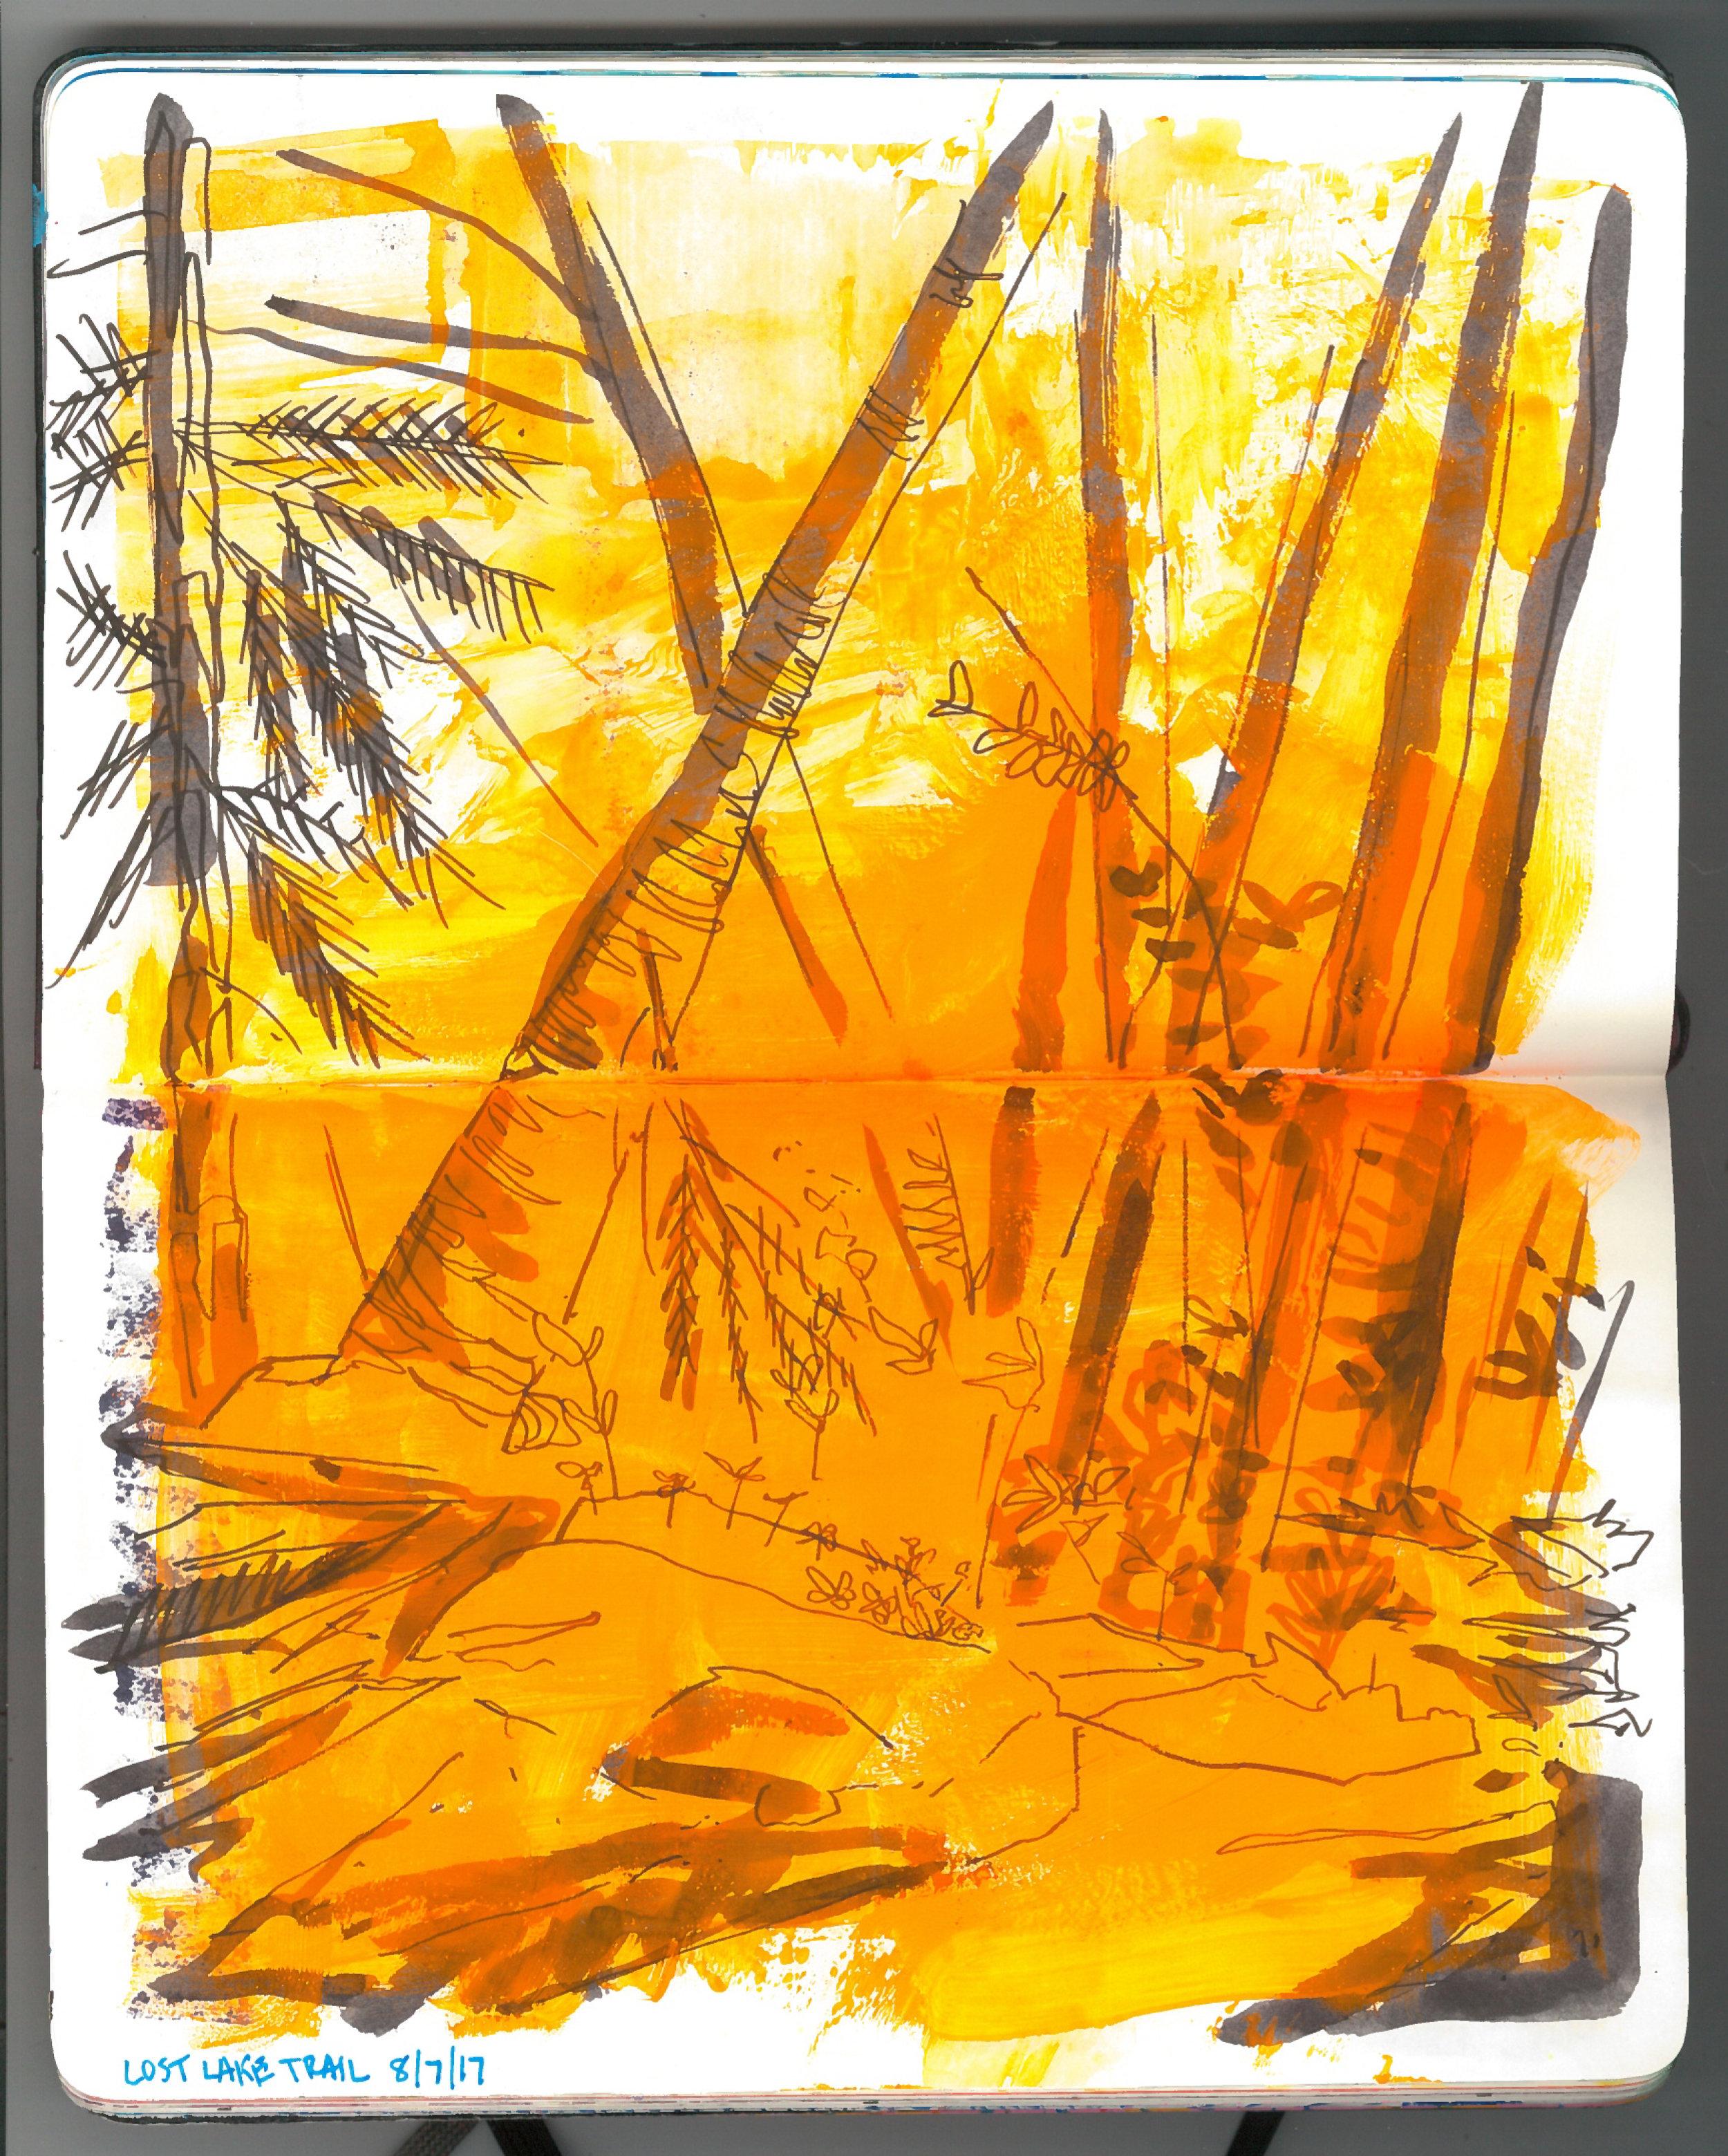 lost lake trail sketch.jpg